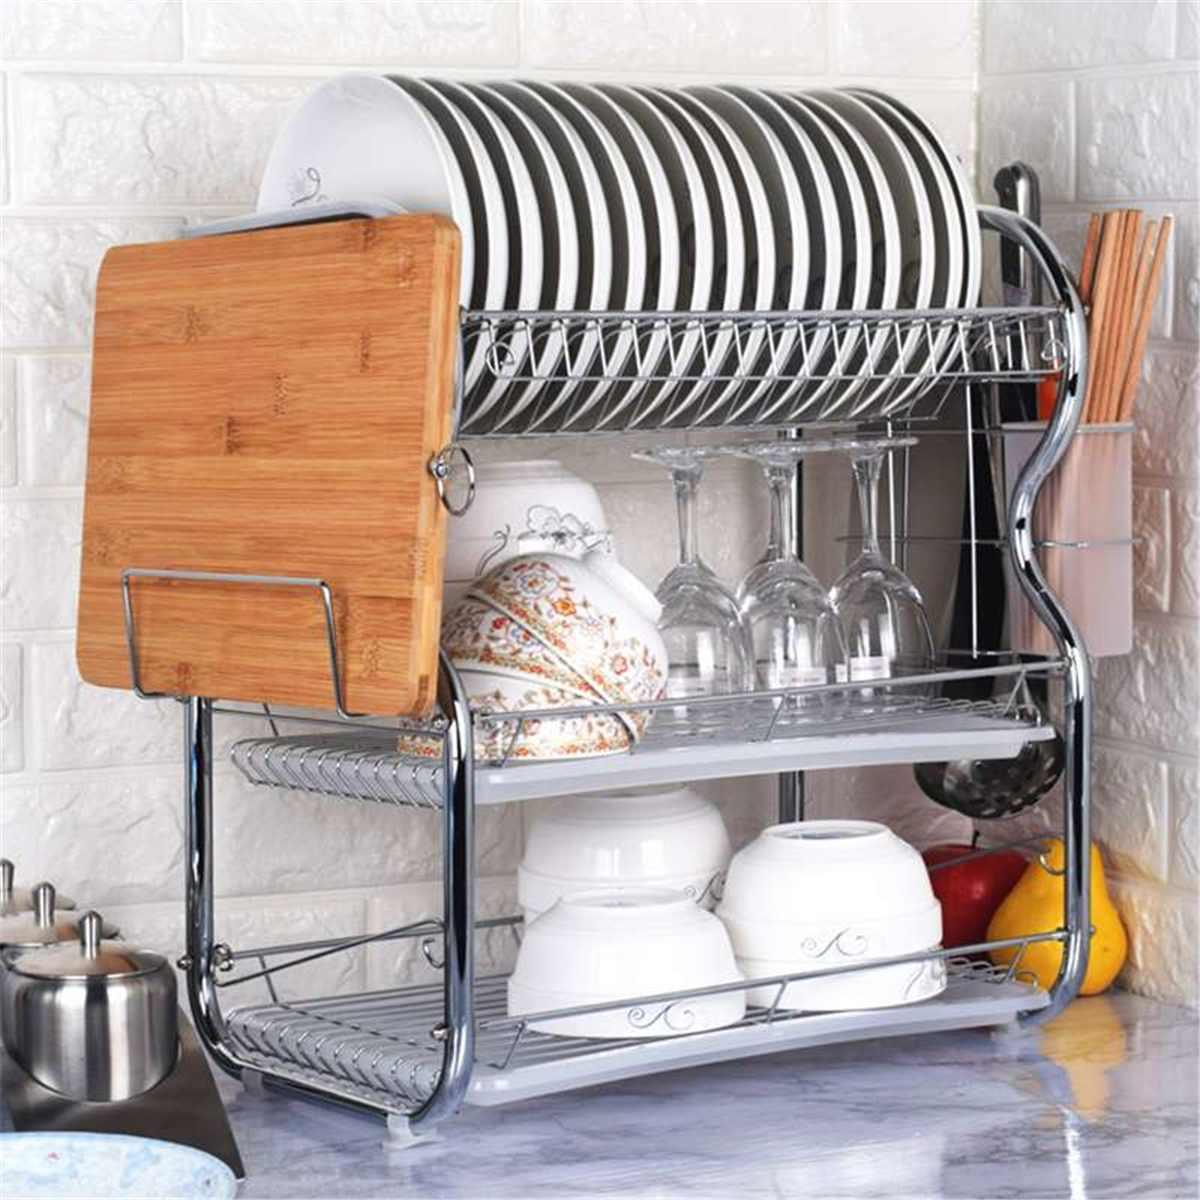 3 Layer Stainless Steel Cutlery Stand Shelf Cutlery Dish Rack Kitchen Dish Storage Rack Drain Storage Rack Knife Holder New